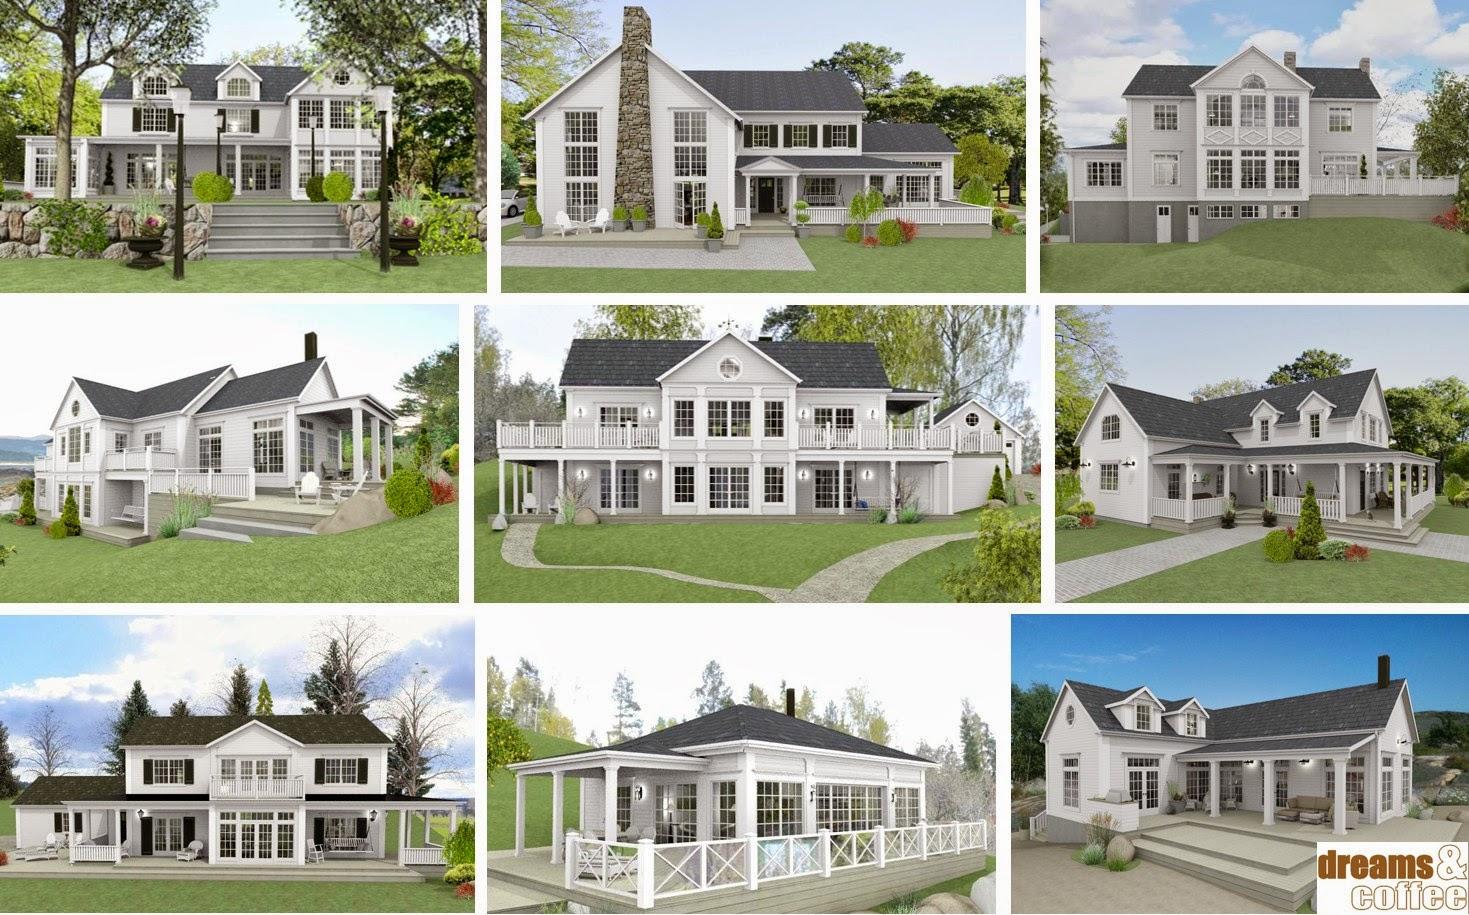 2014 års New England hus